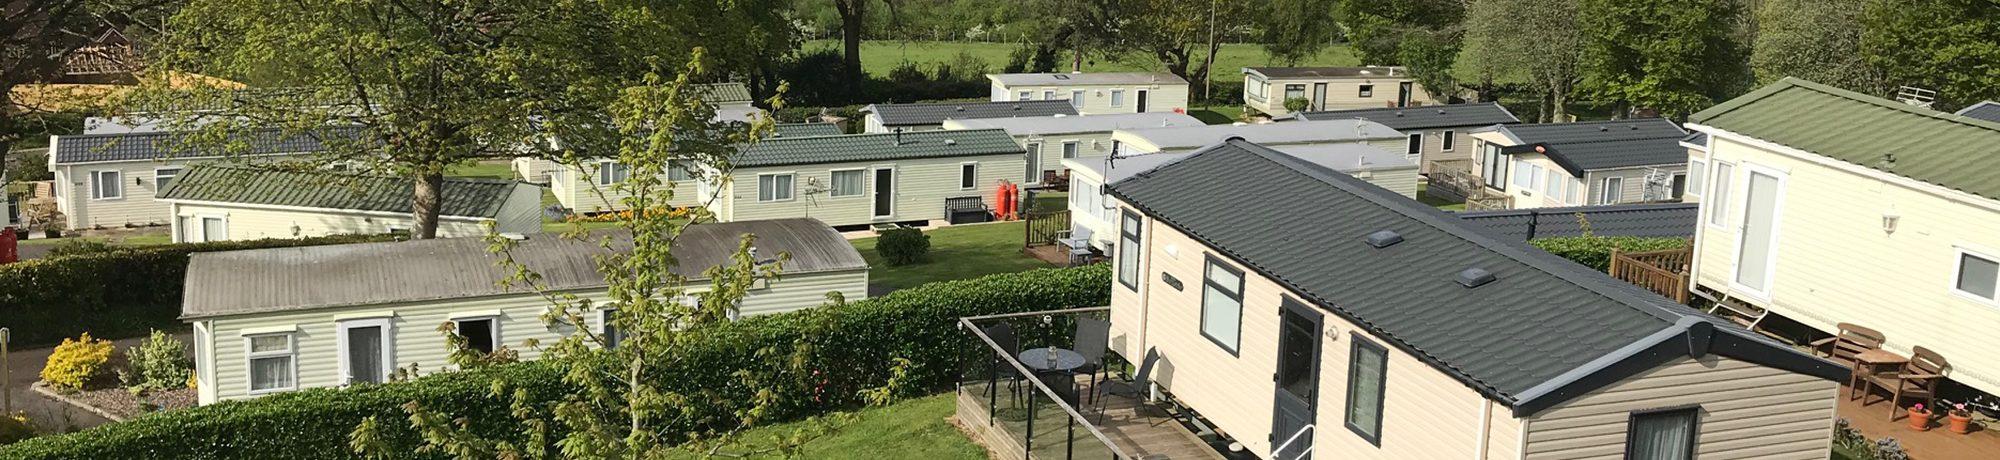 Timber Vale, Slider Image, Lyme Regis, Caravan Park, Campsite, Dorset, Jurassic Coast, Dorset Campsite 11